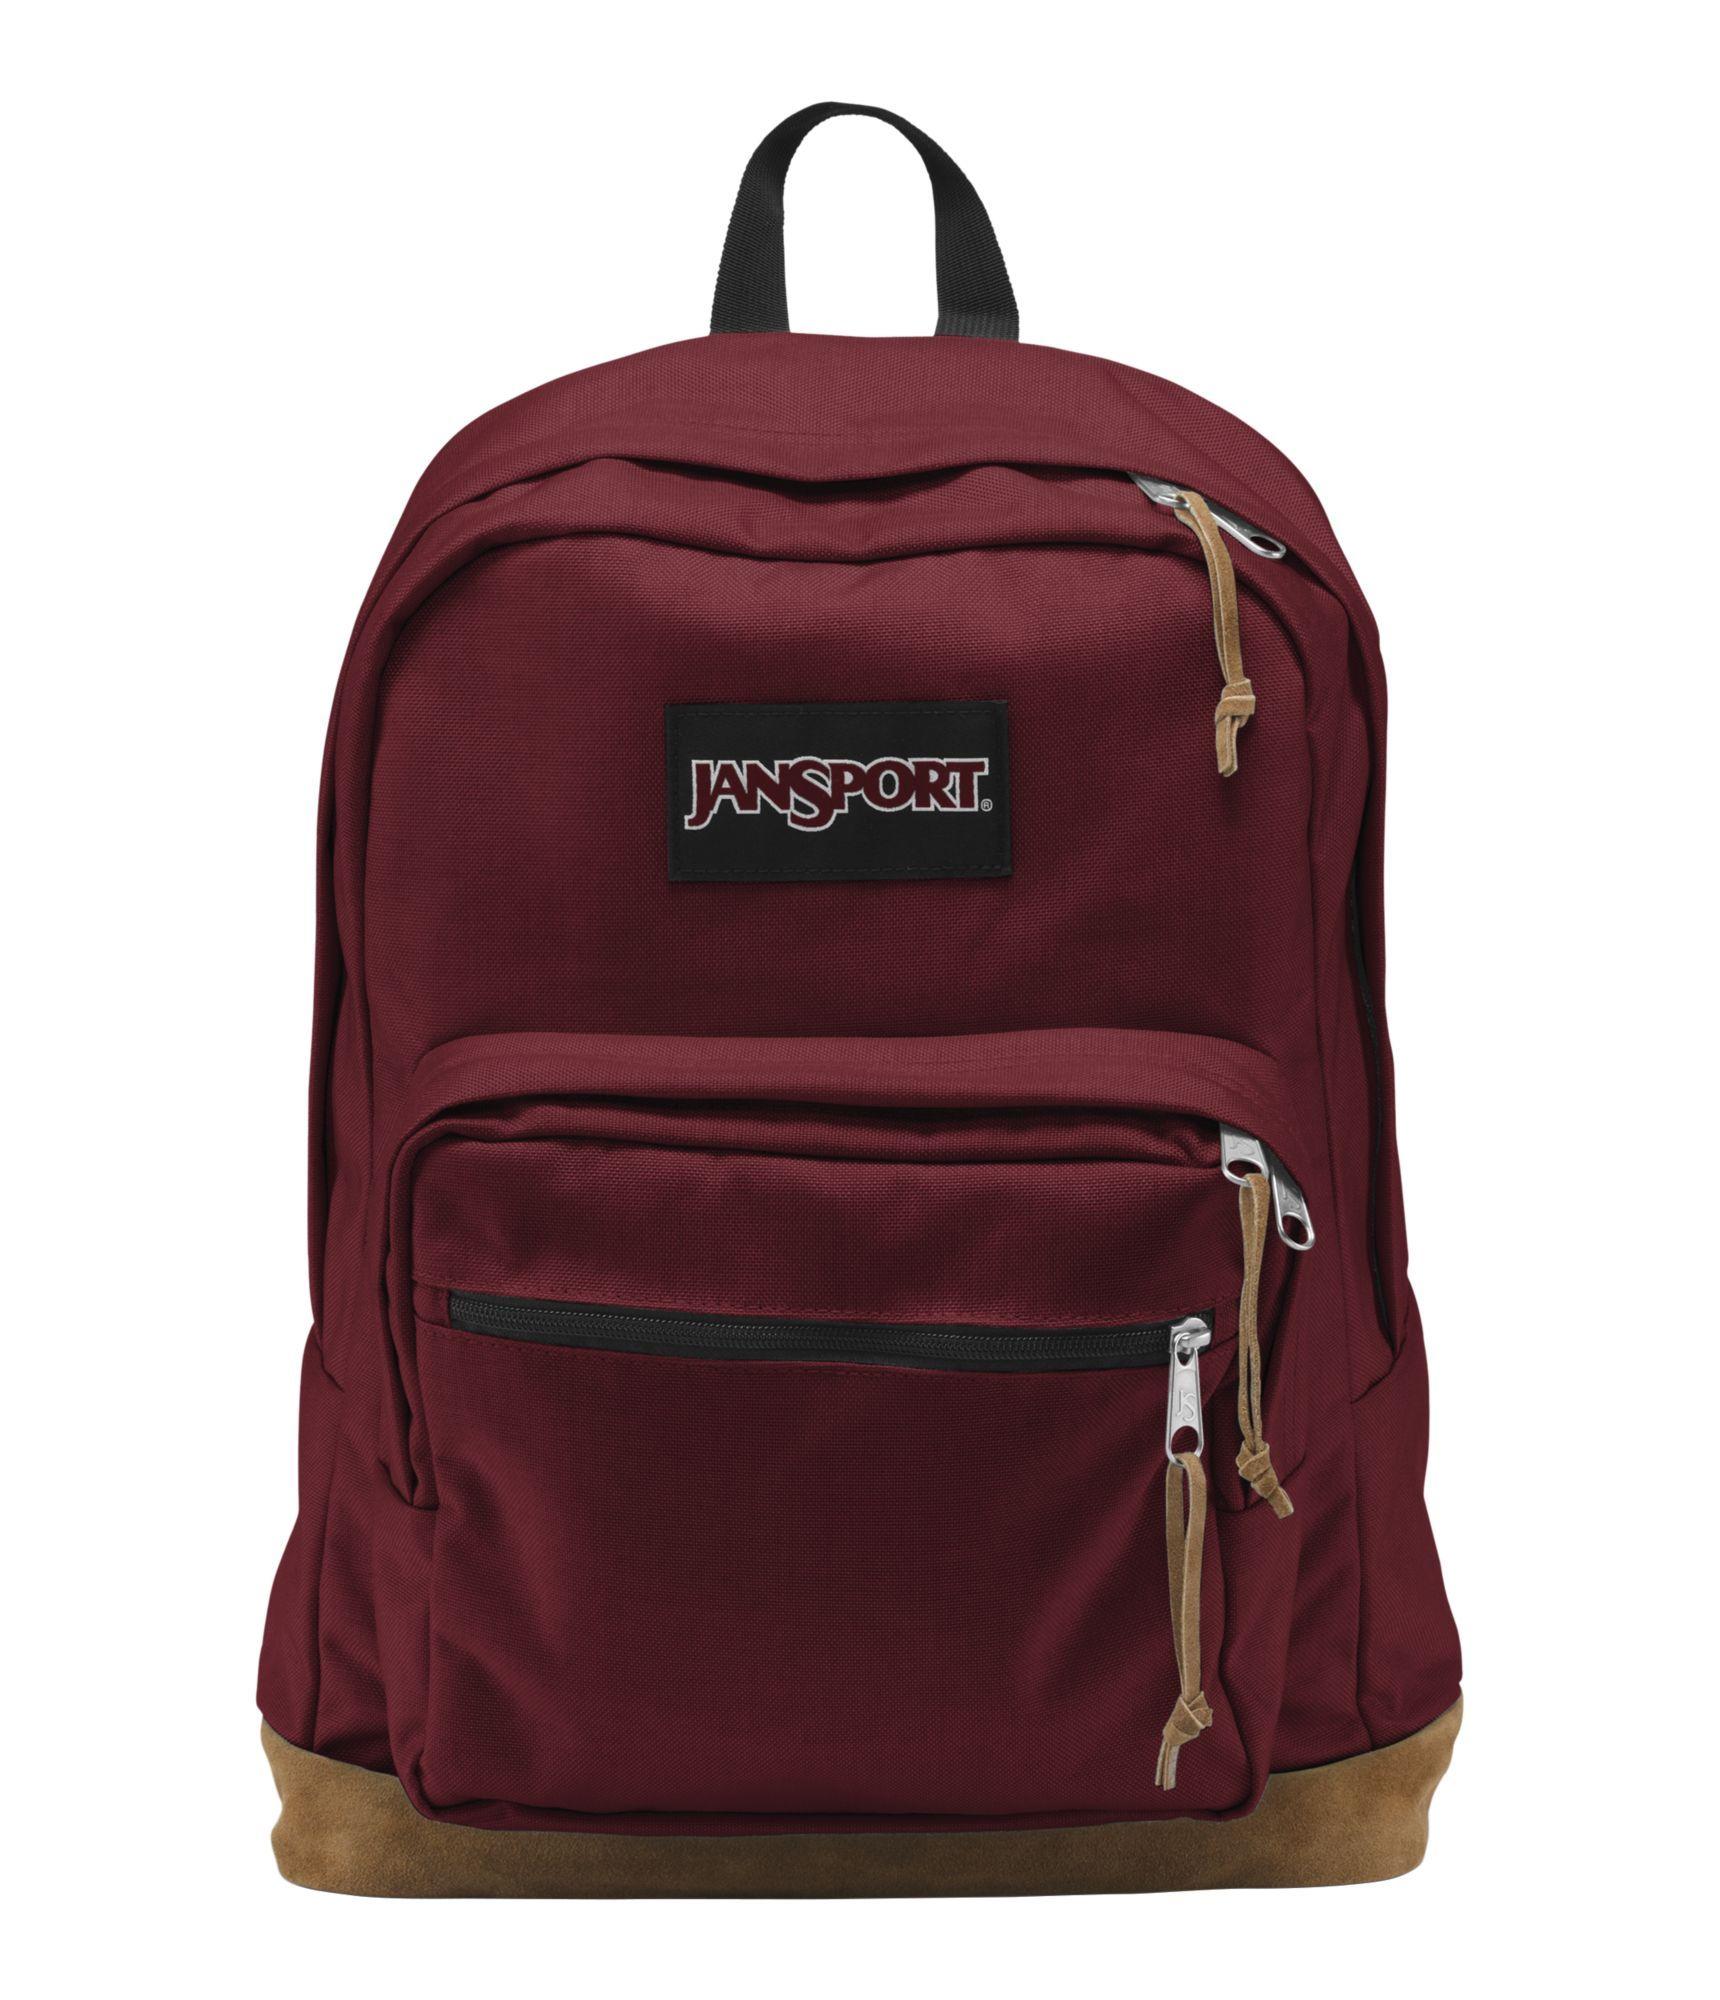 JanSport Right Pack Backpack Stylish backpacks, Jansport